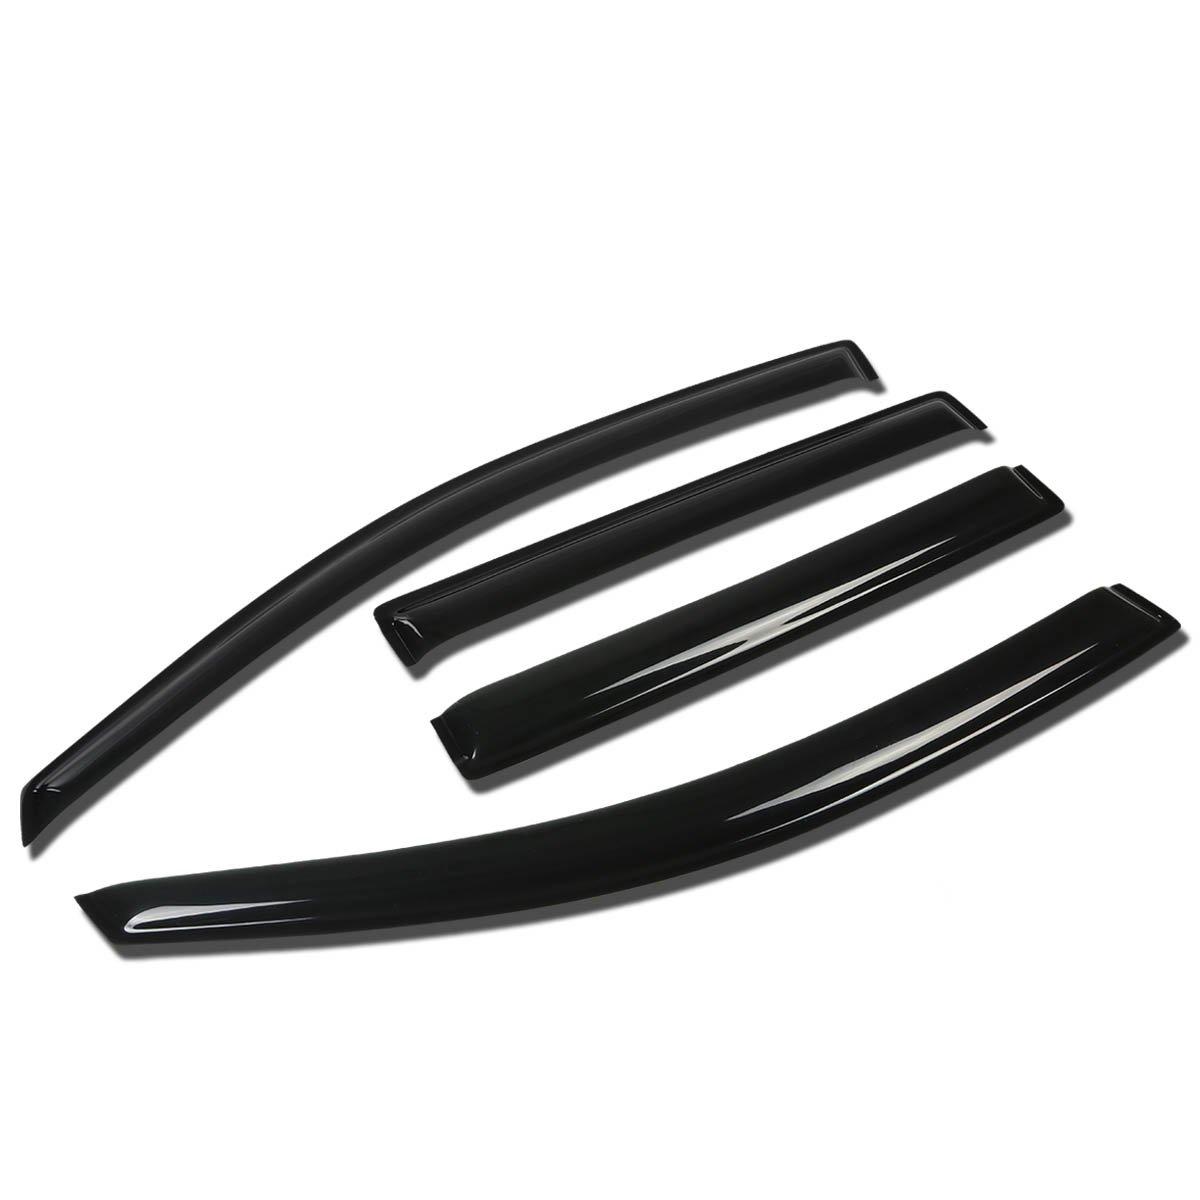 Amazon.com: For Nissan Armada WA60 VK 4pcs Tape-On Window Visor Deflector  Rain Guard: Automotive